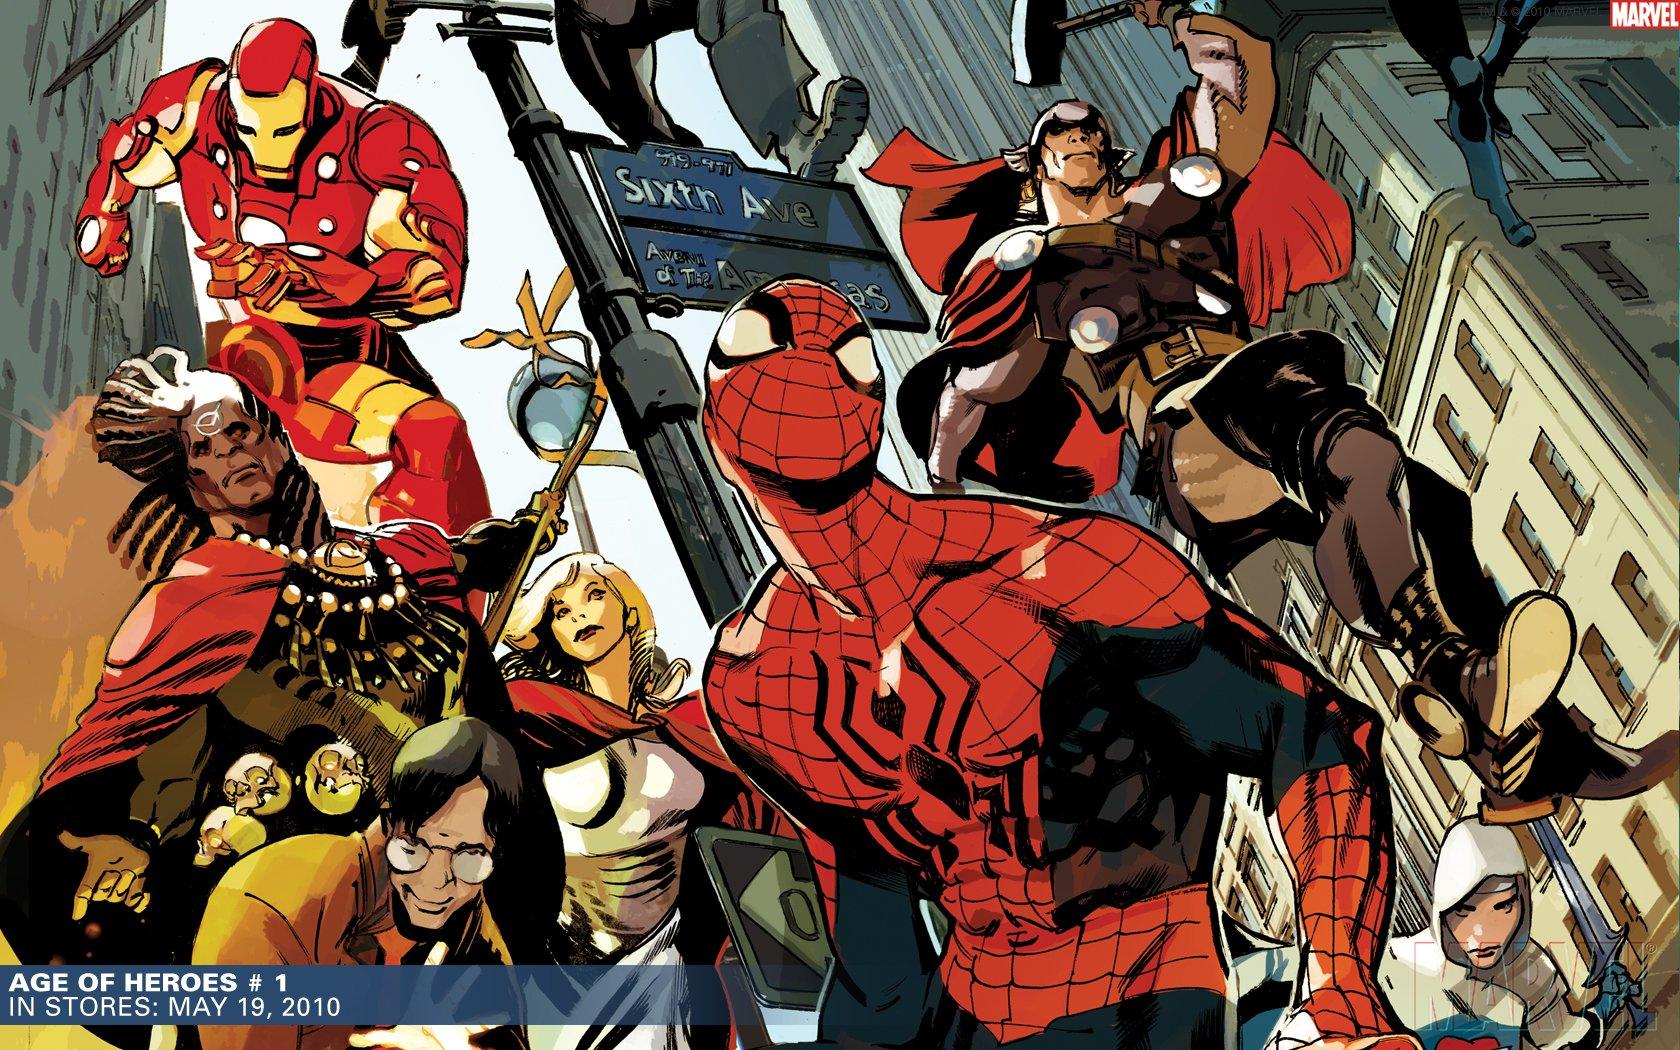 Imagenes De Ironman Para Fondo De Pantalla: Iron Man Thor Spider-Man Marvel Comics Wallpaper